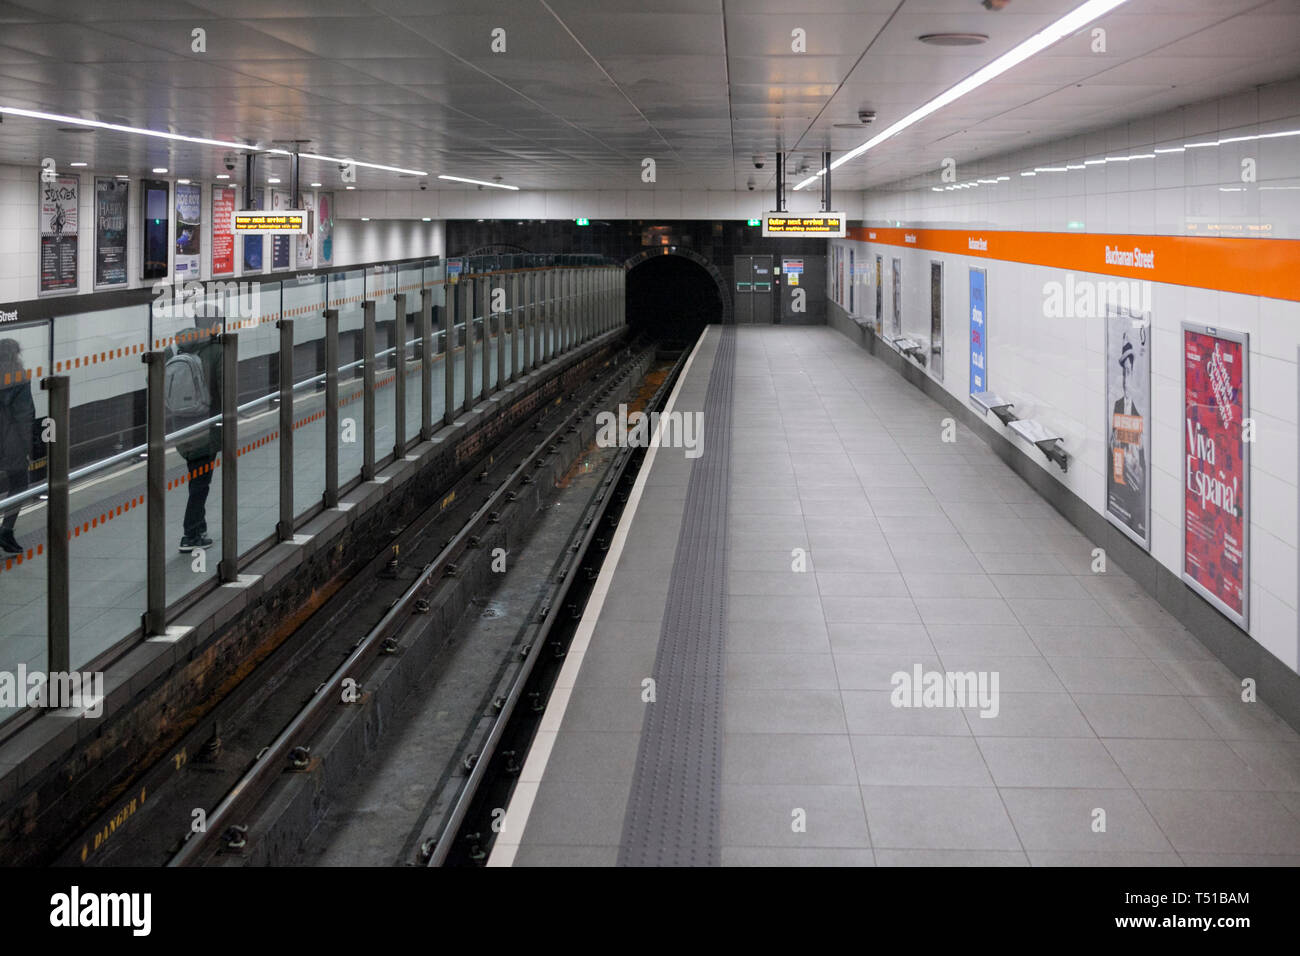 Glasgow Buchanan street underground station on the SPT glasgow subway - Stock Image